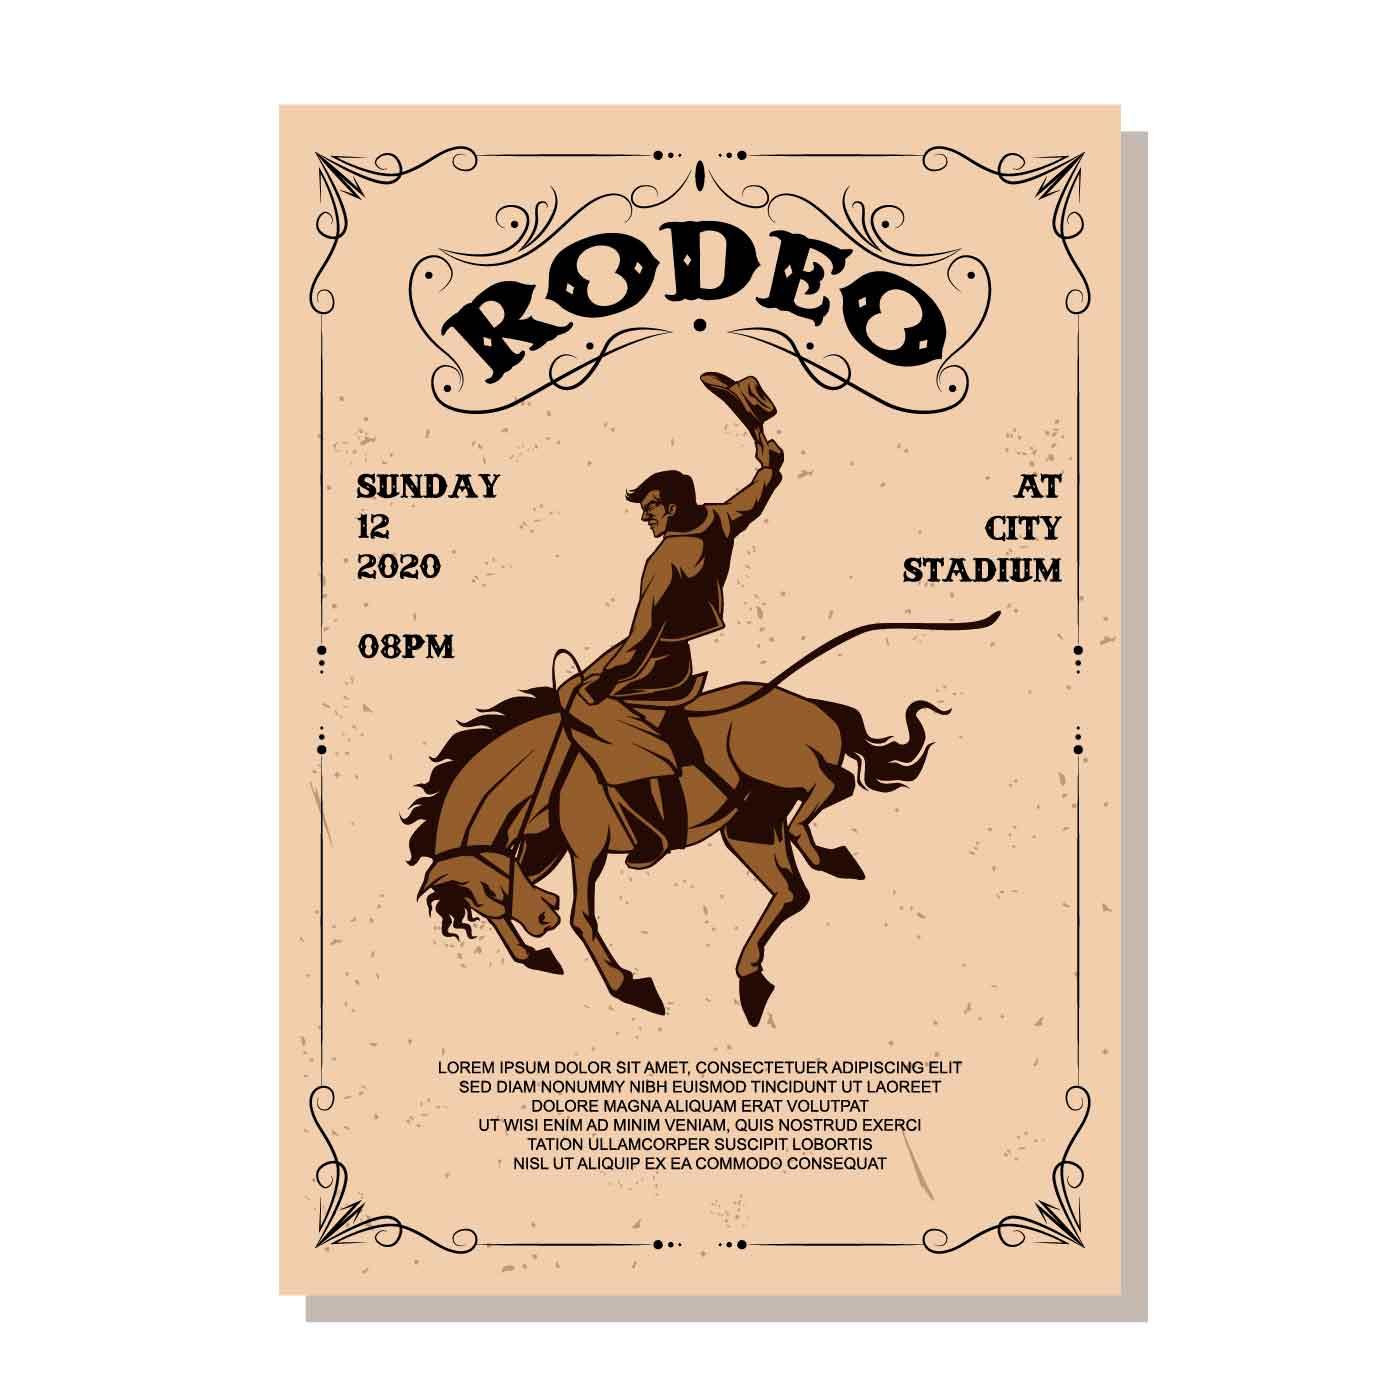 Rodeo Flyer Vector - Download Free Vectors, Clipart ...